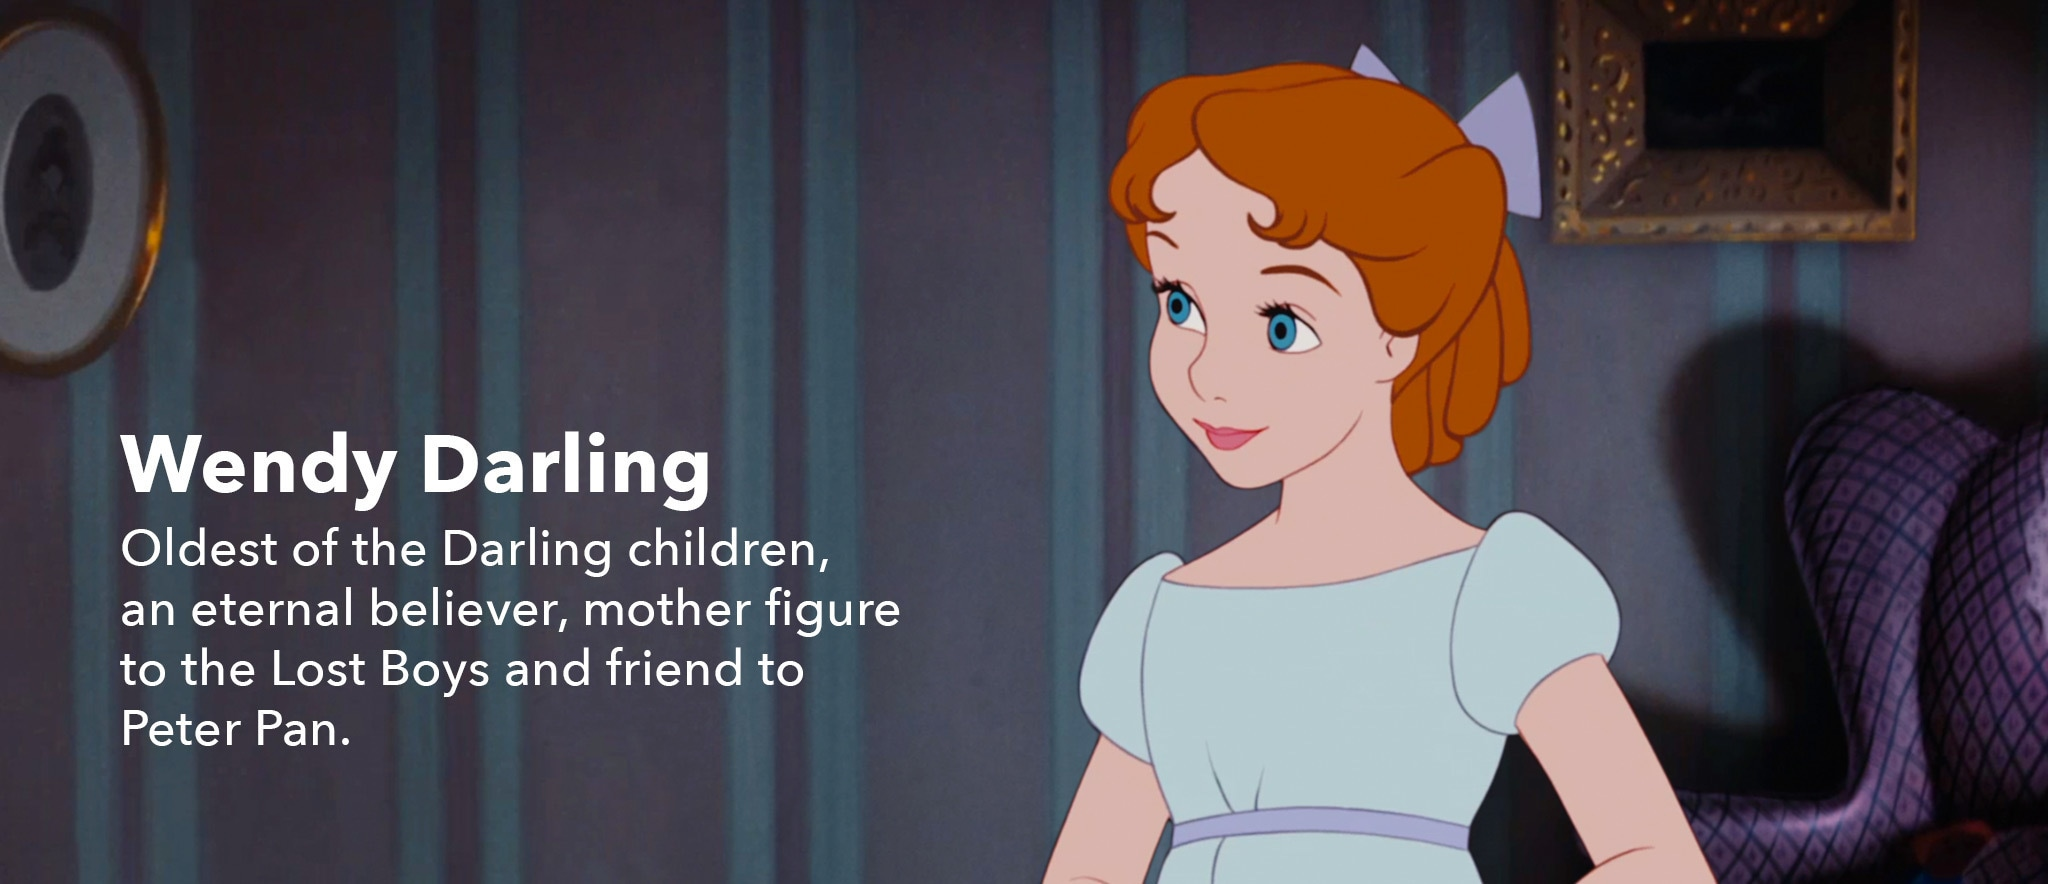 Peter Pan Disney Movies